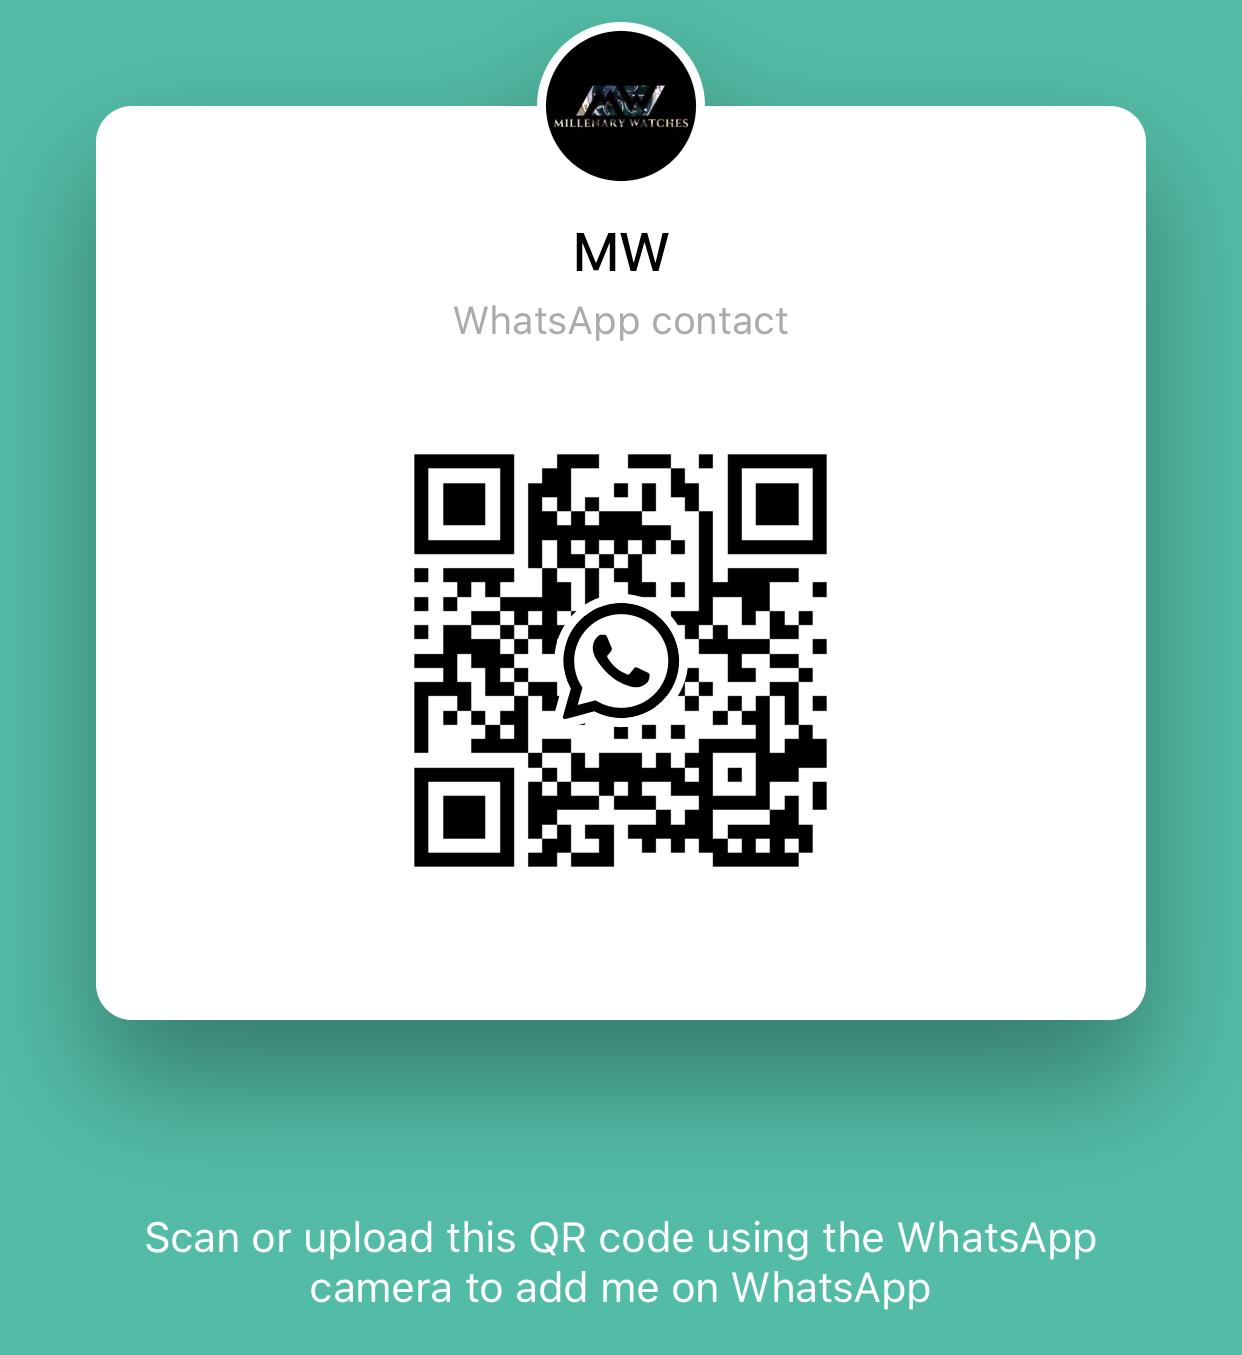 Millenary Watches WhatsApp